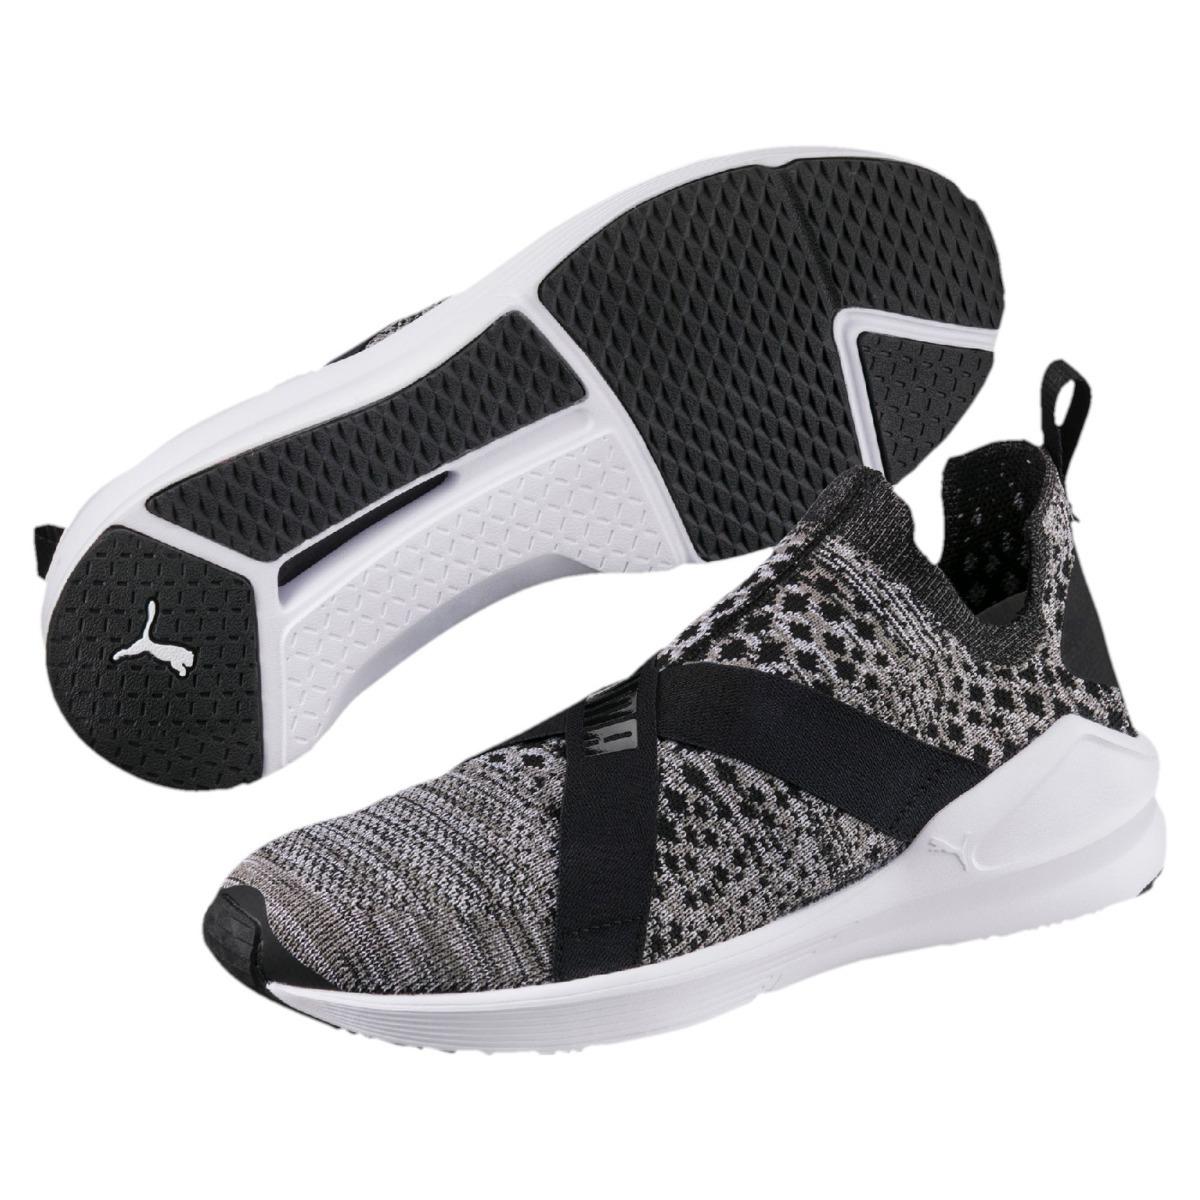 0c51ce6049487e Cargando zoom... zapatillas urbanas puma fierce evoknit wns   brand sports